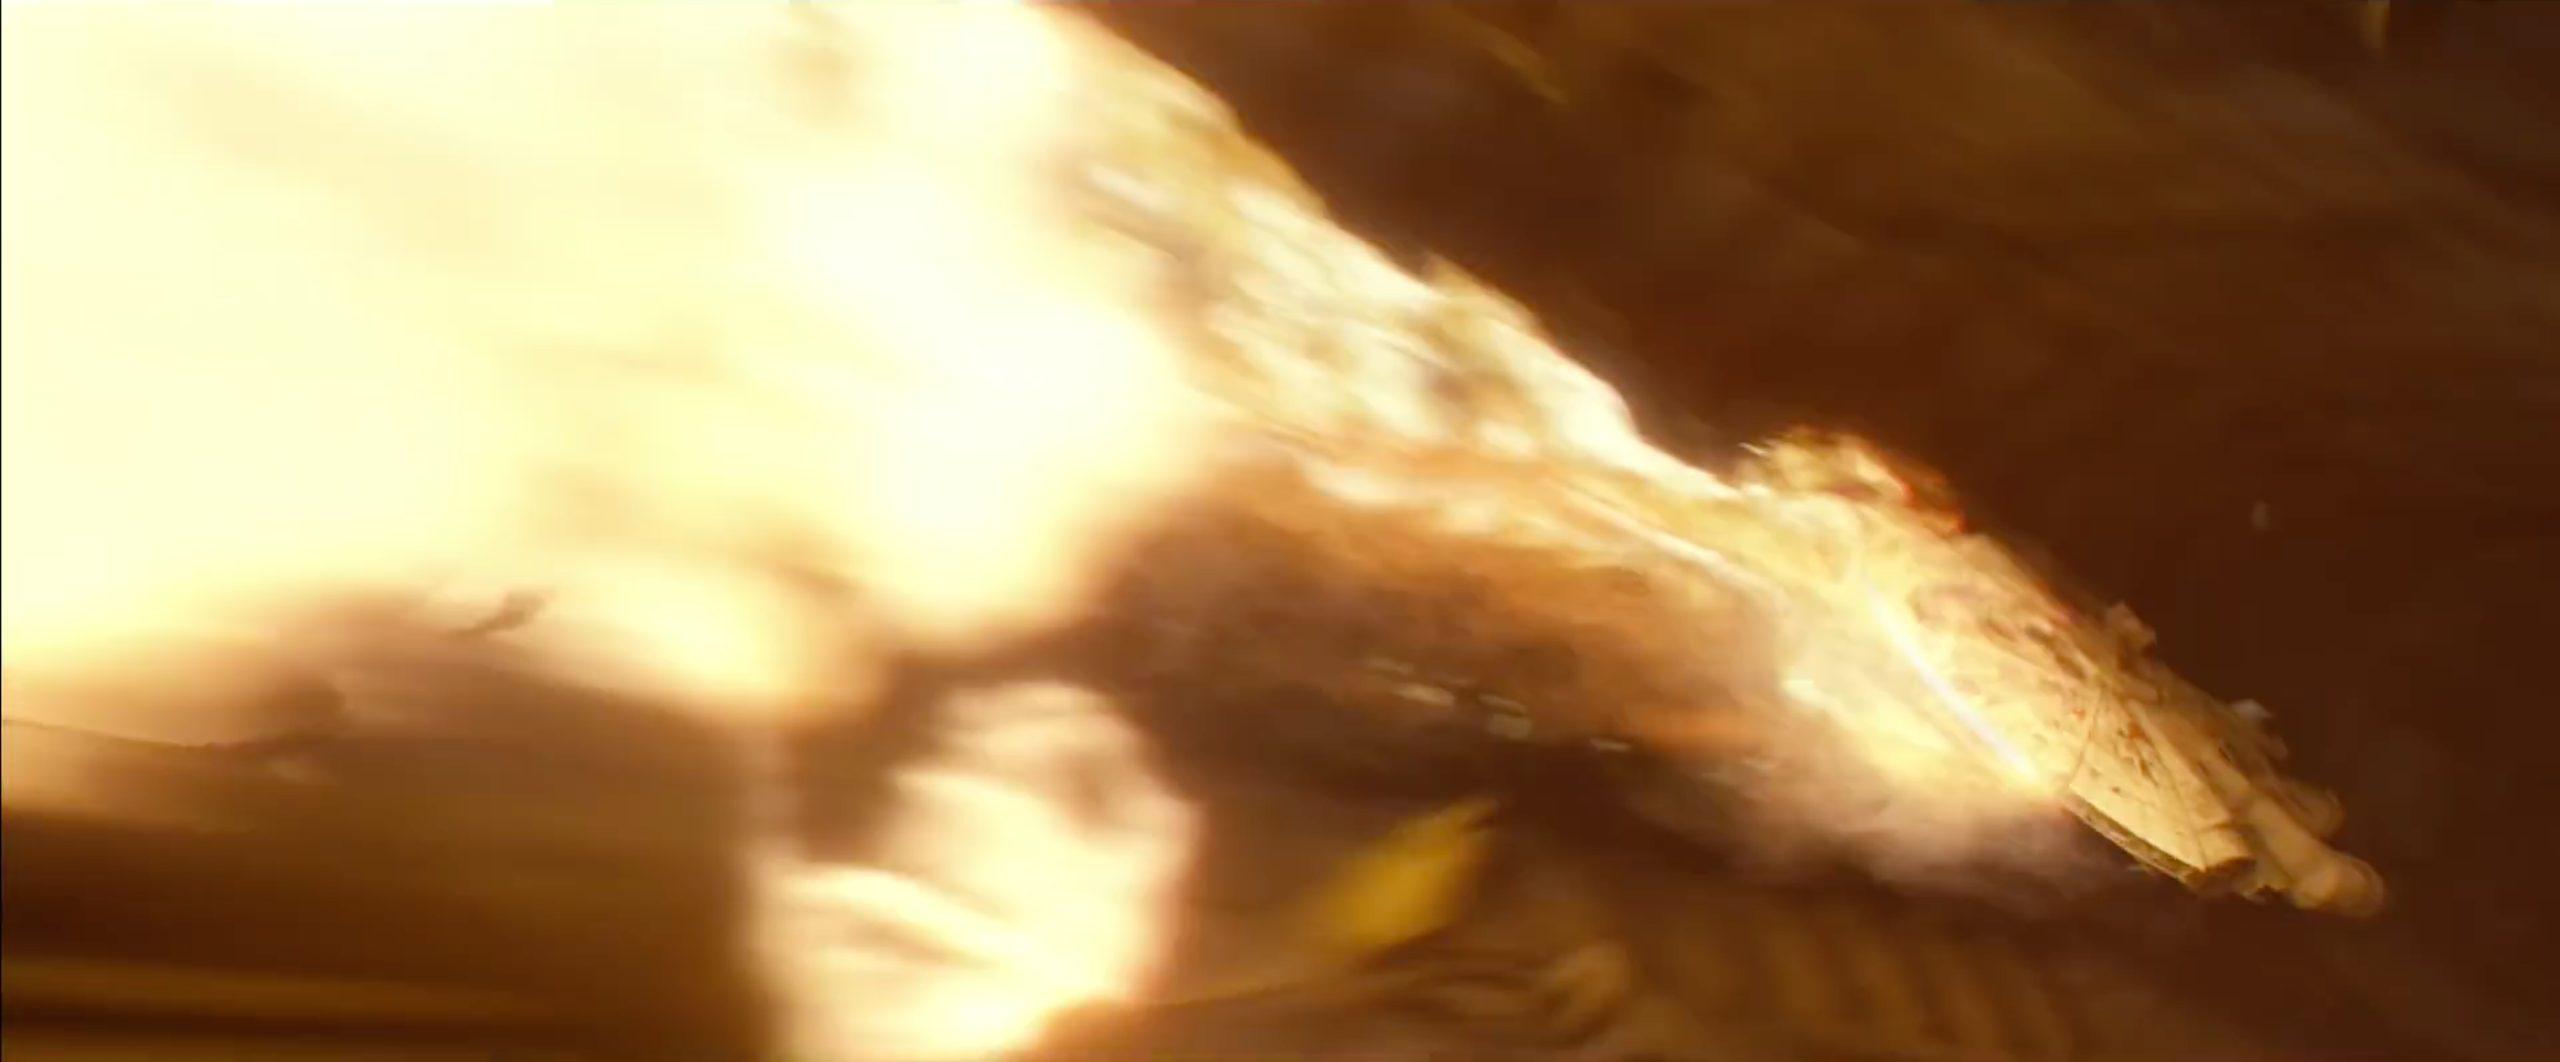 Millenium Falcon in a fireball | Blurbomat.com